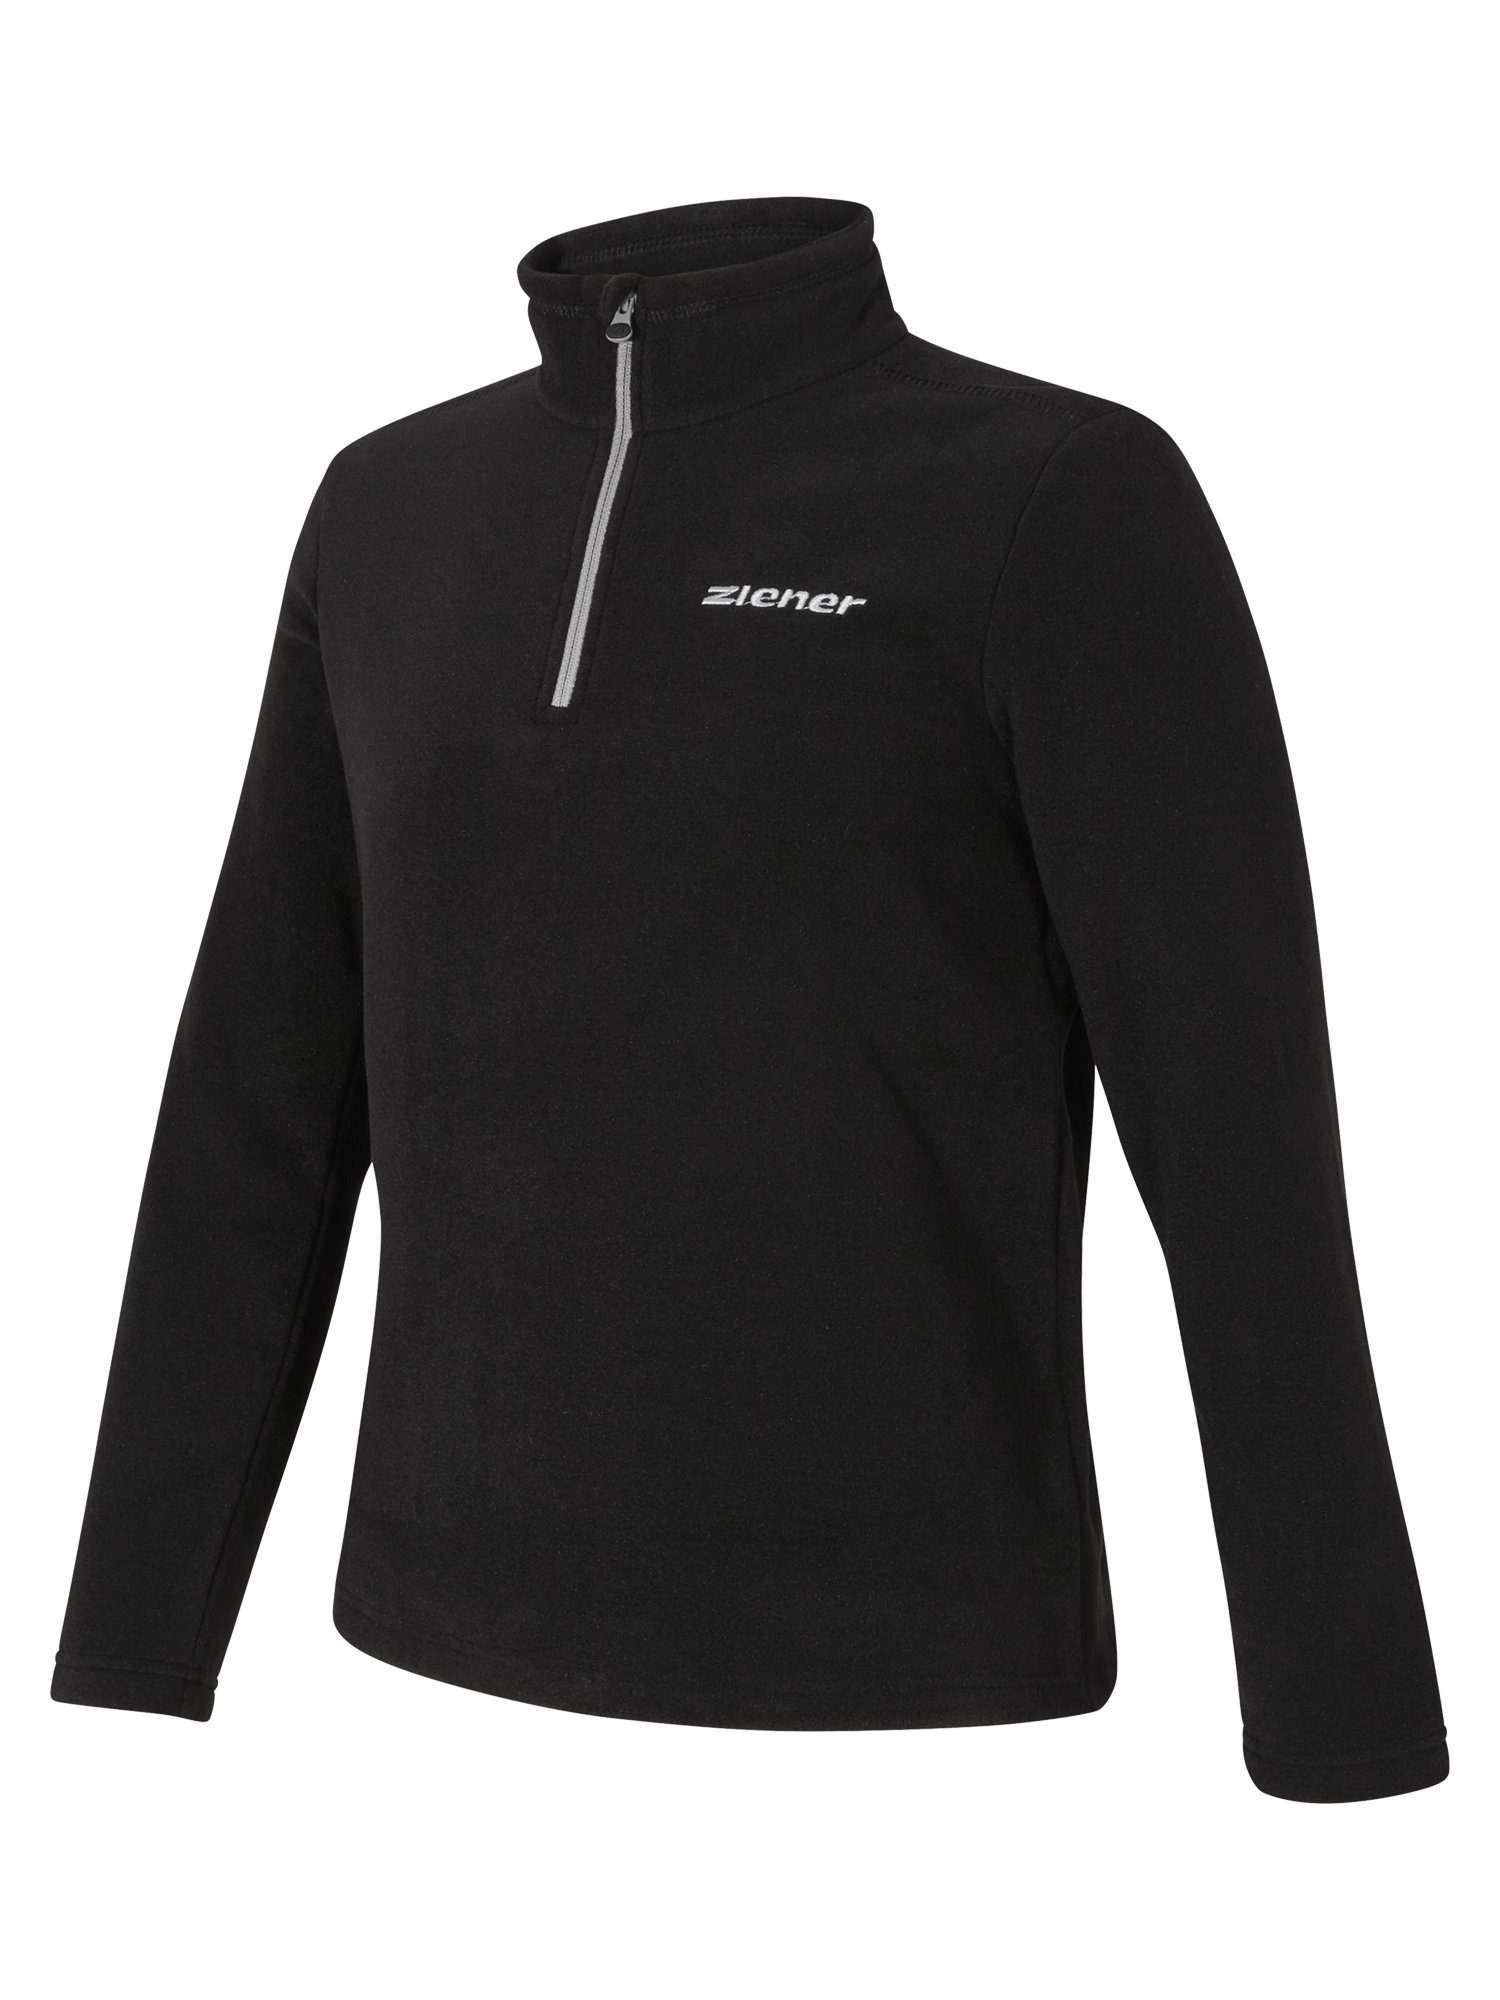 Ziener Fleeceshirt »JAMIL«, funktioneller, wärmender Juniro Fleece Unterzieher online kaufen | OTTO